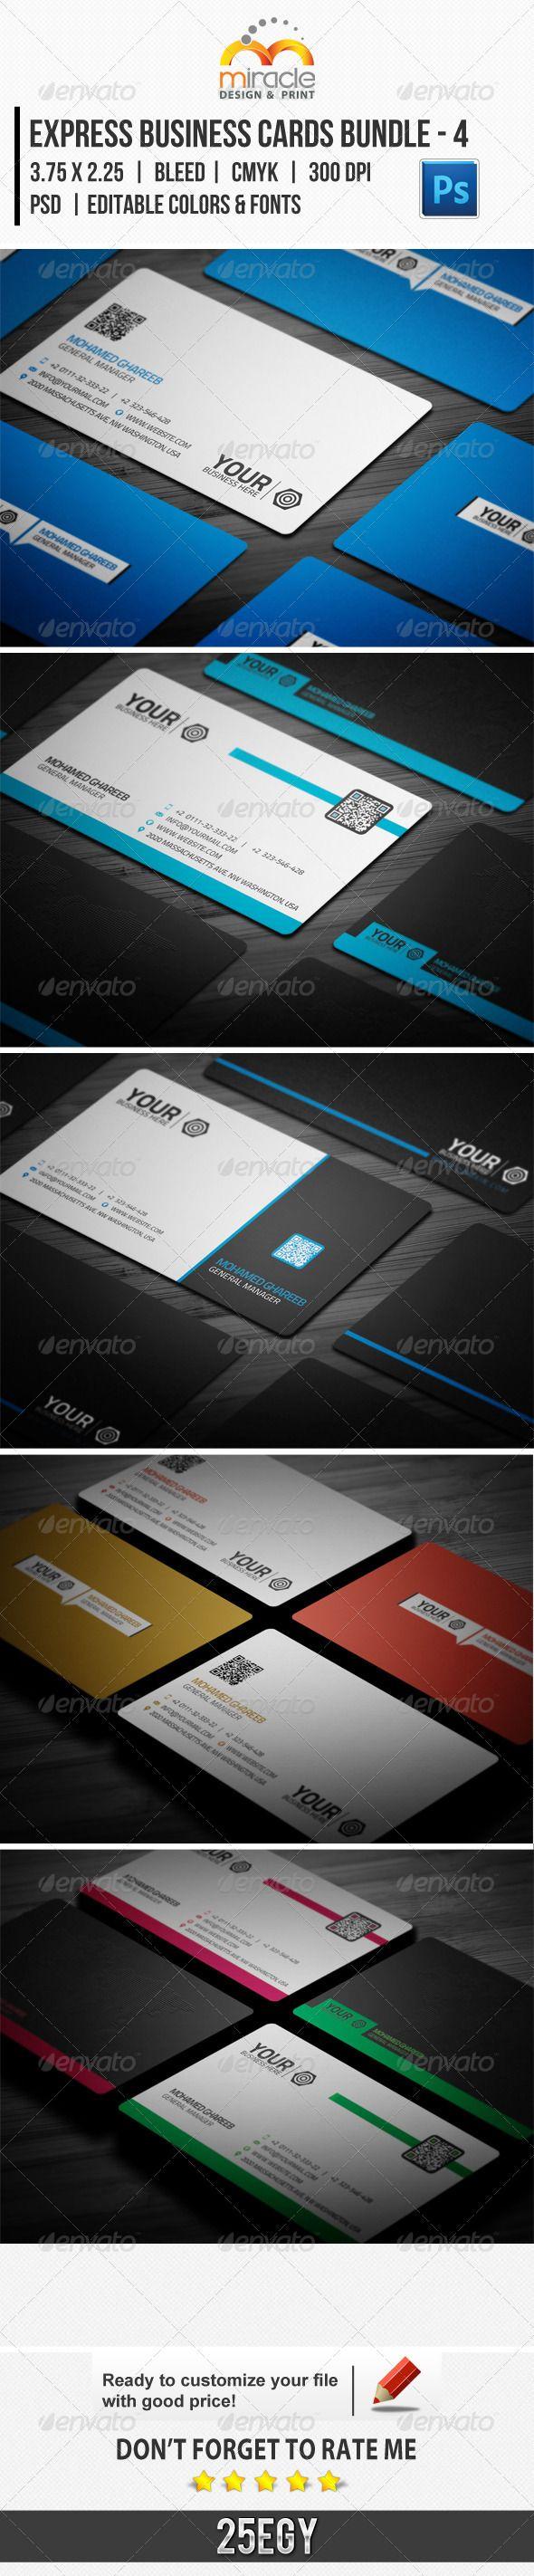 Express Business Cards Bundle - 4 | Business cards, Card templates ...